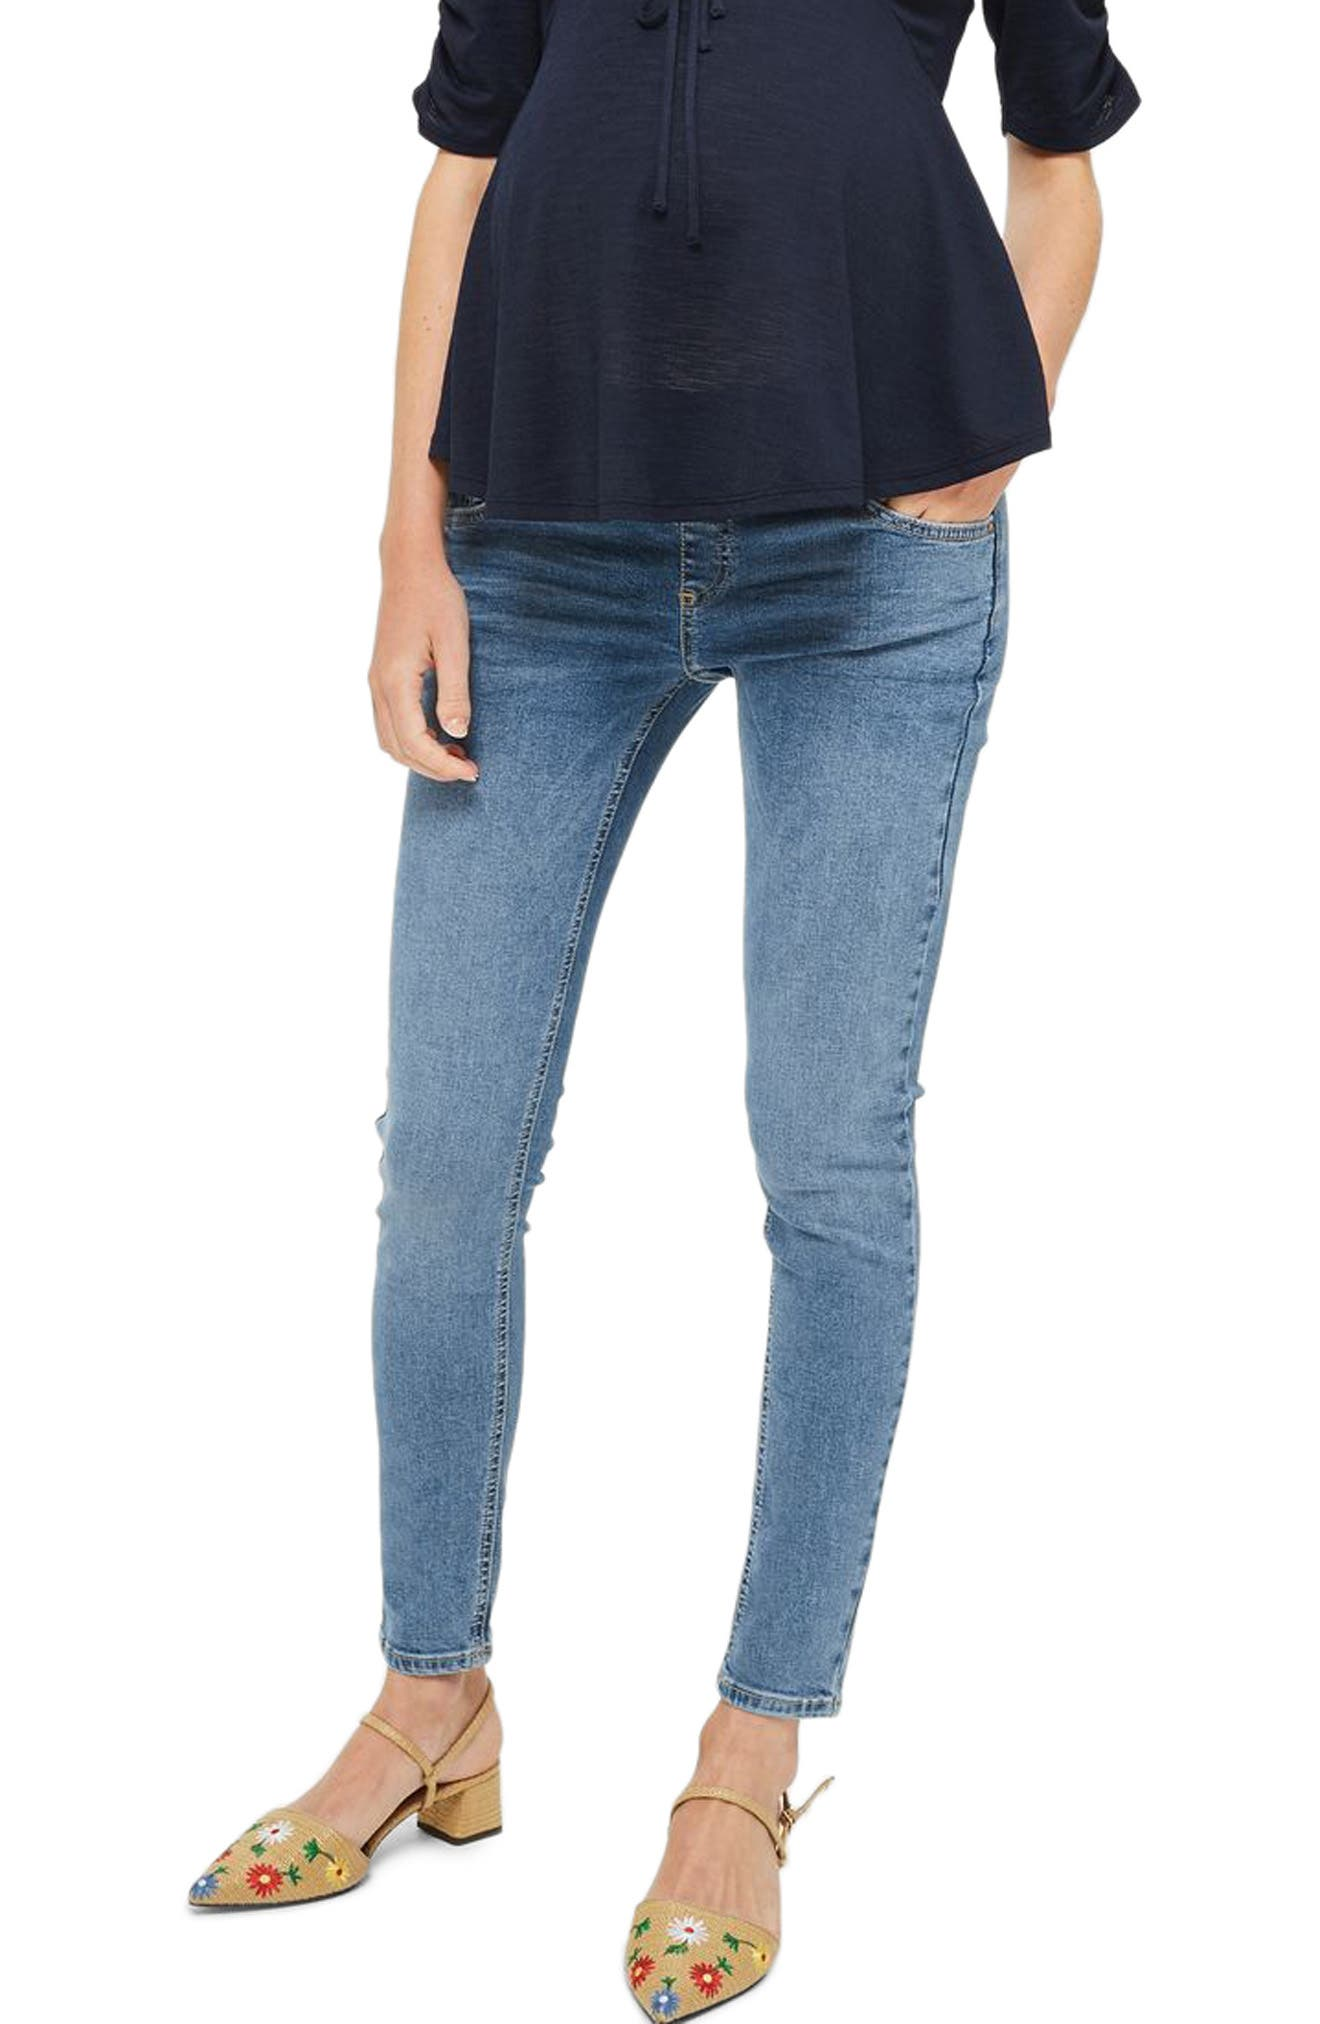 Topshop Jamie Maternity Skinny Jeans